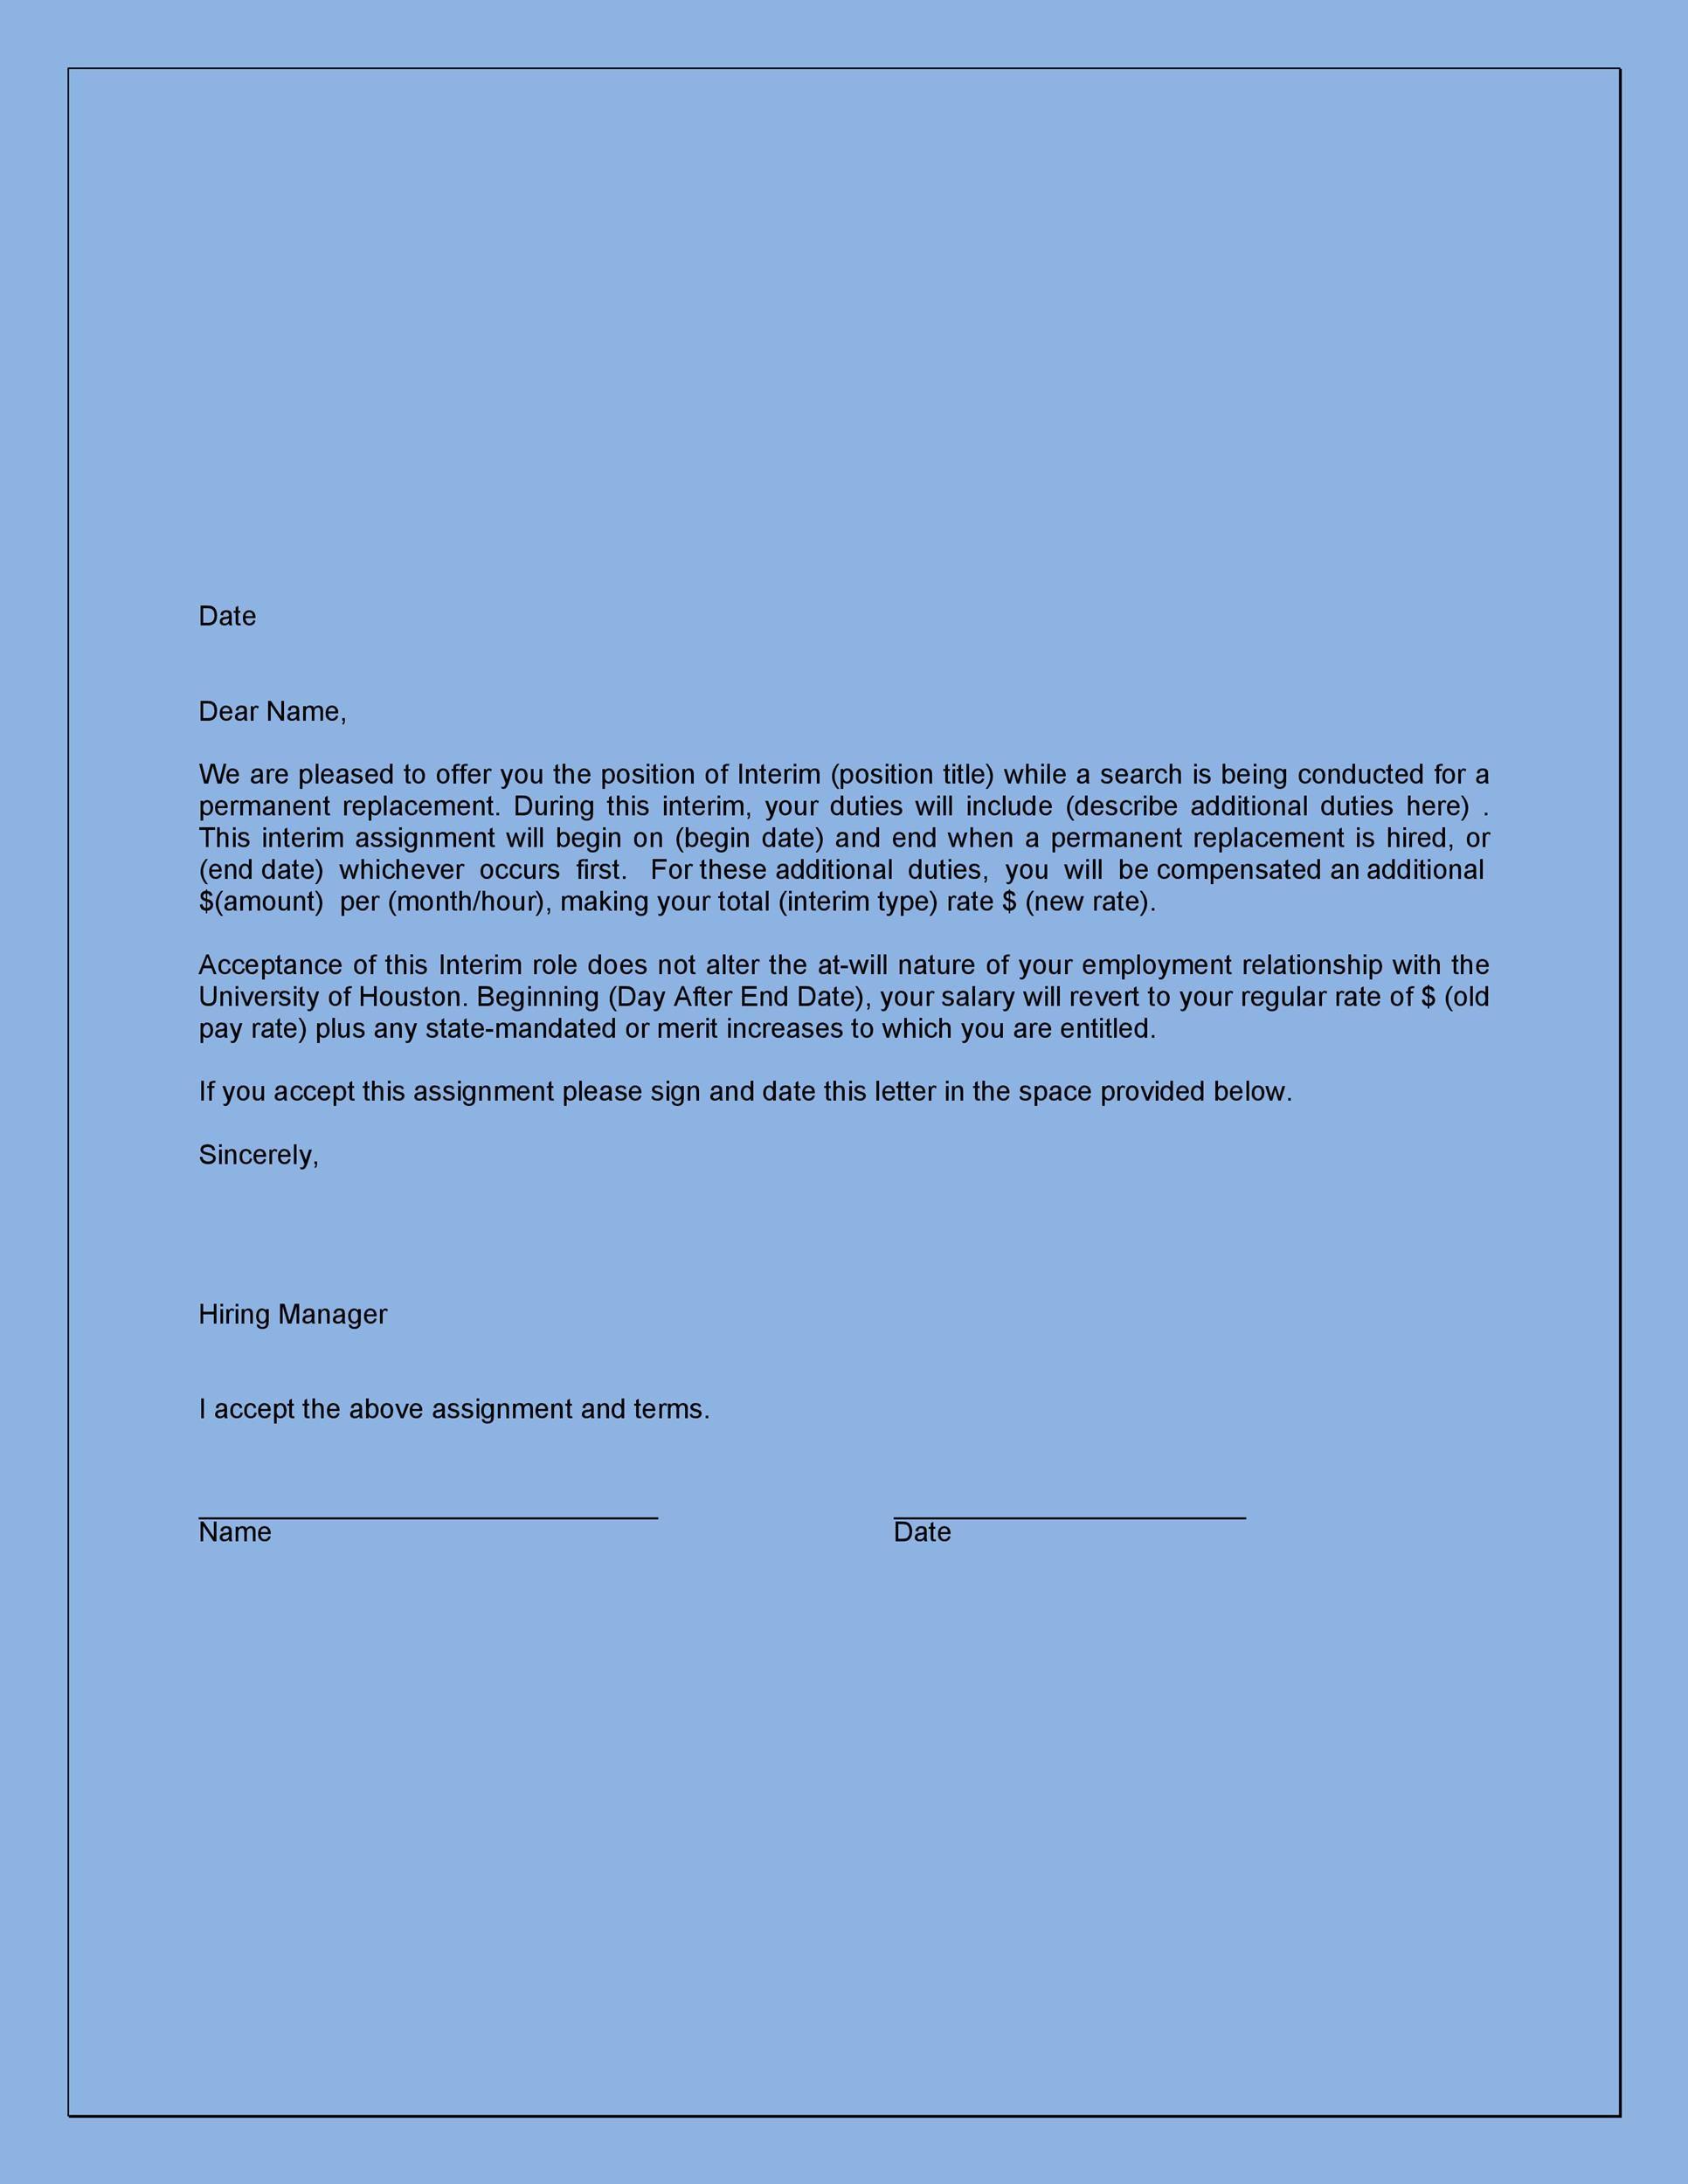 Free job acceptance letter 31